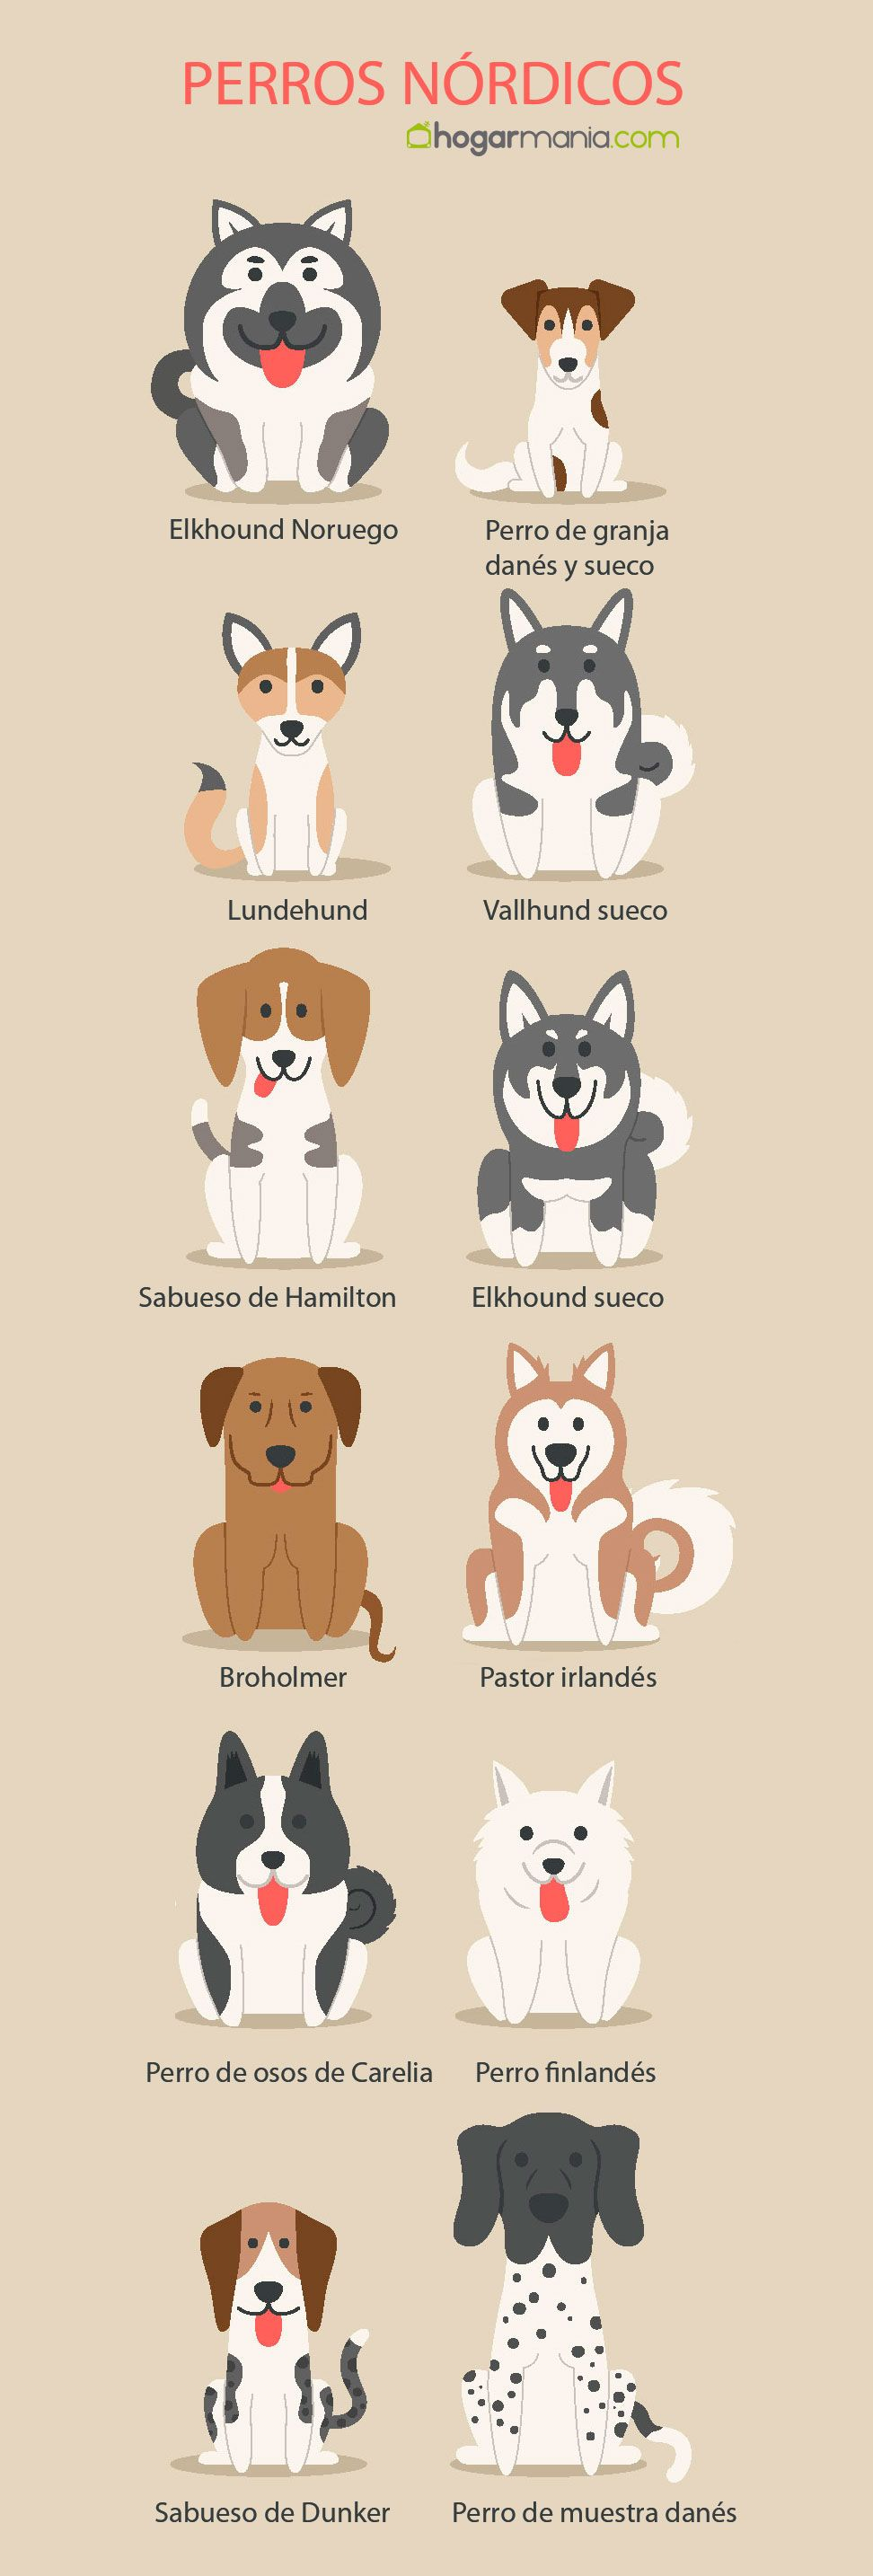 razas perros nórdicos